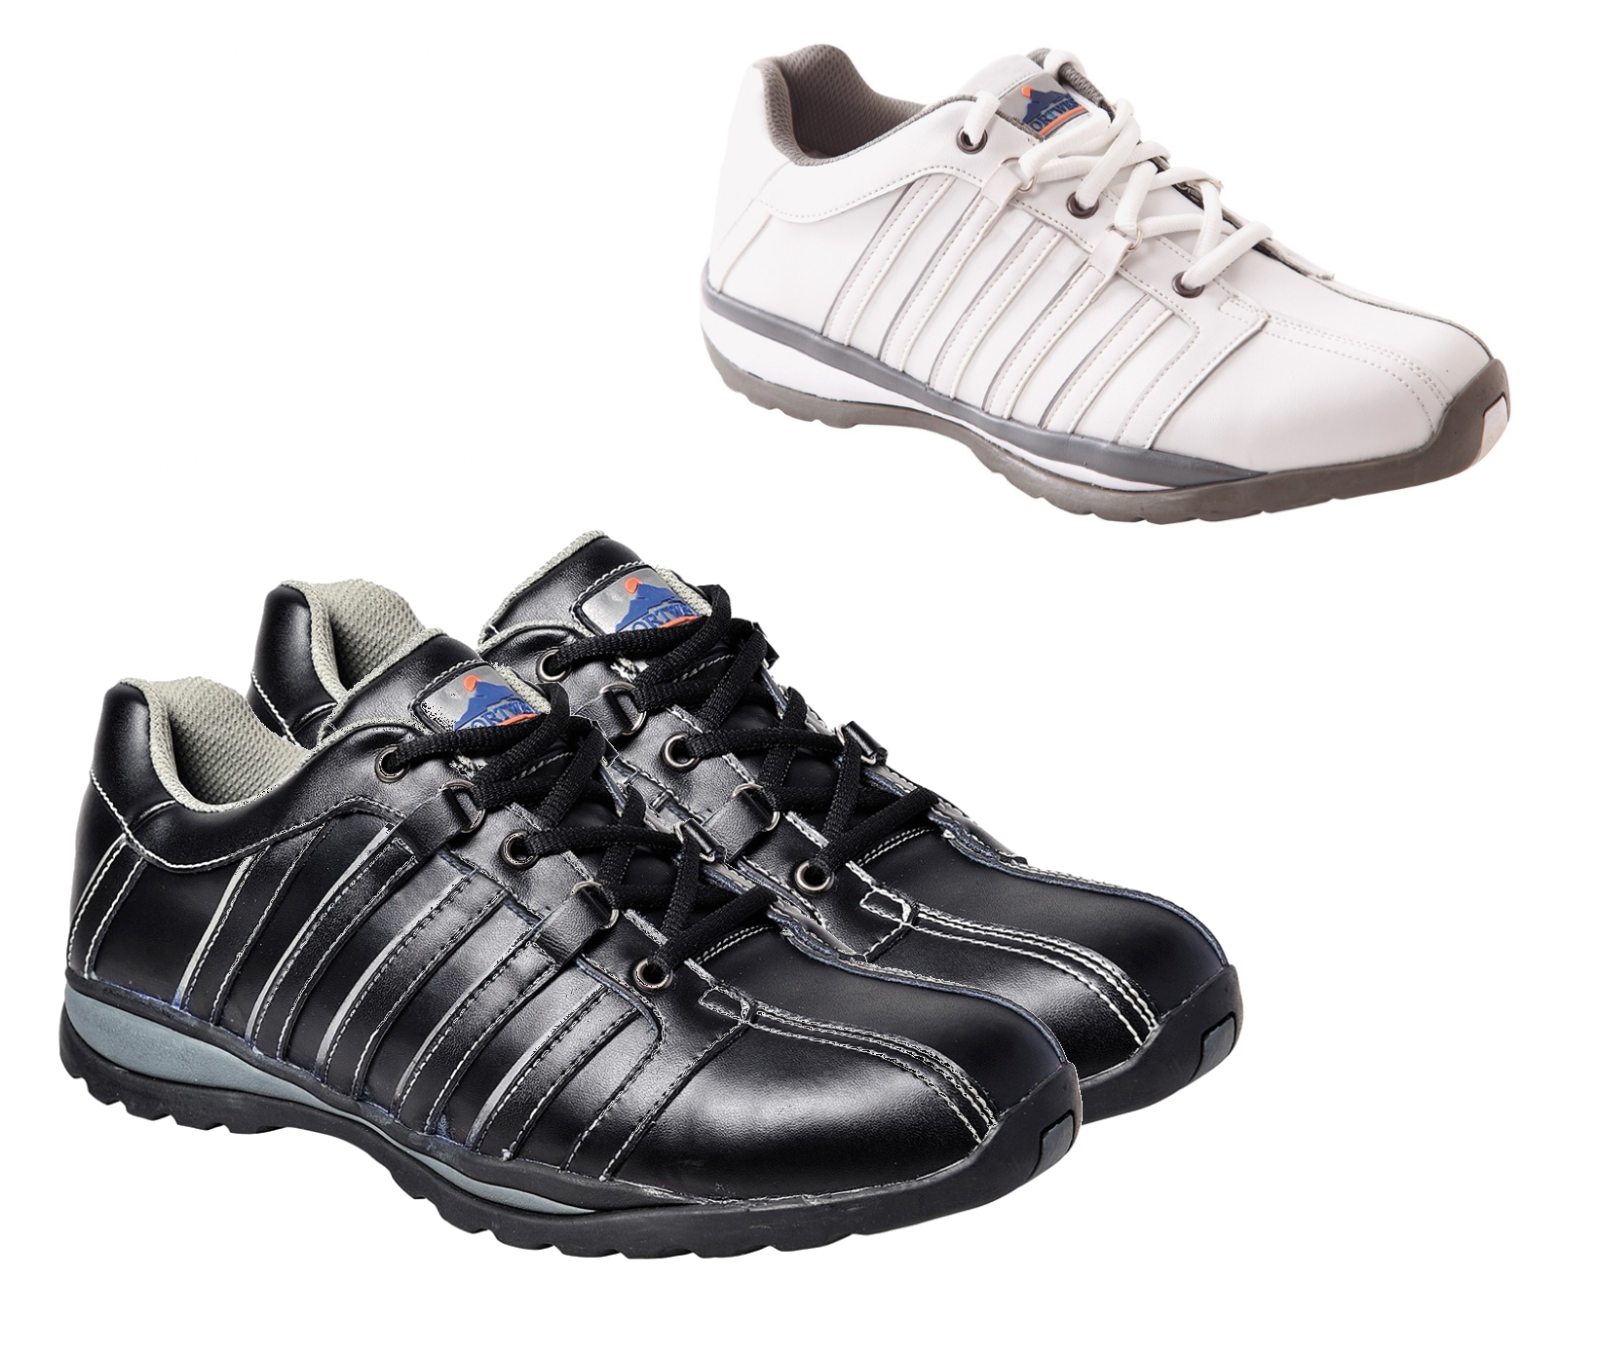 Steelite Arx Safety Trainer Boot Workwear Shoe Leather Footwear Portwest FW33